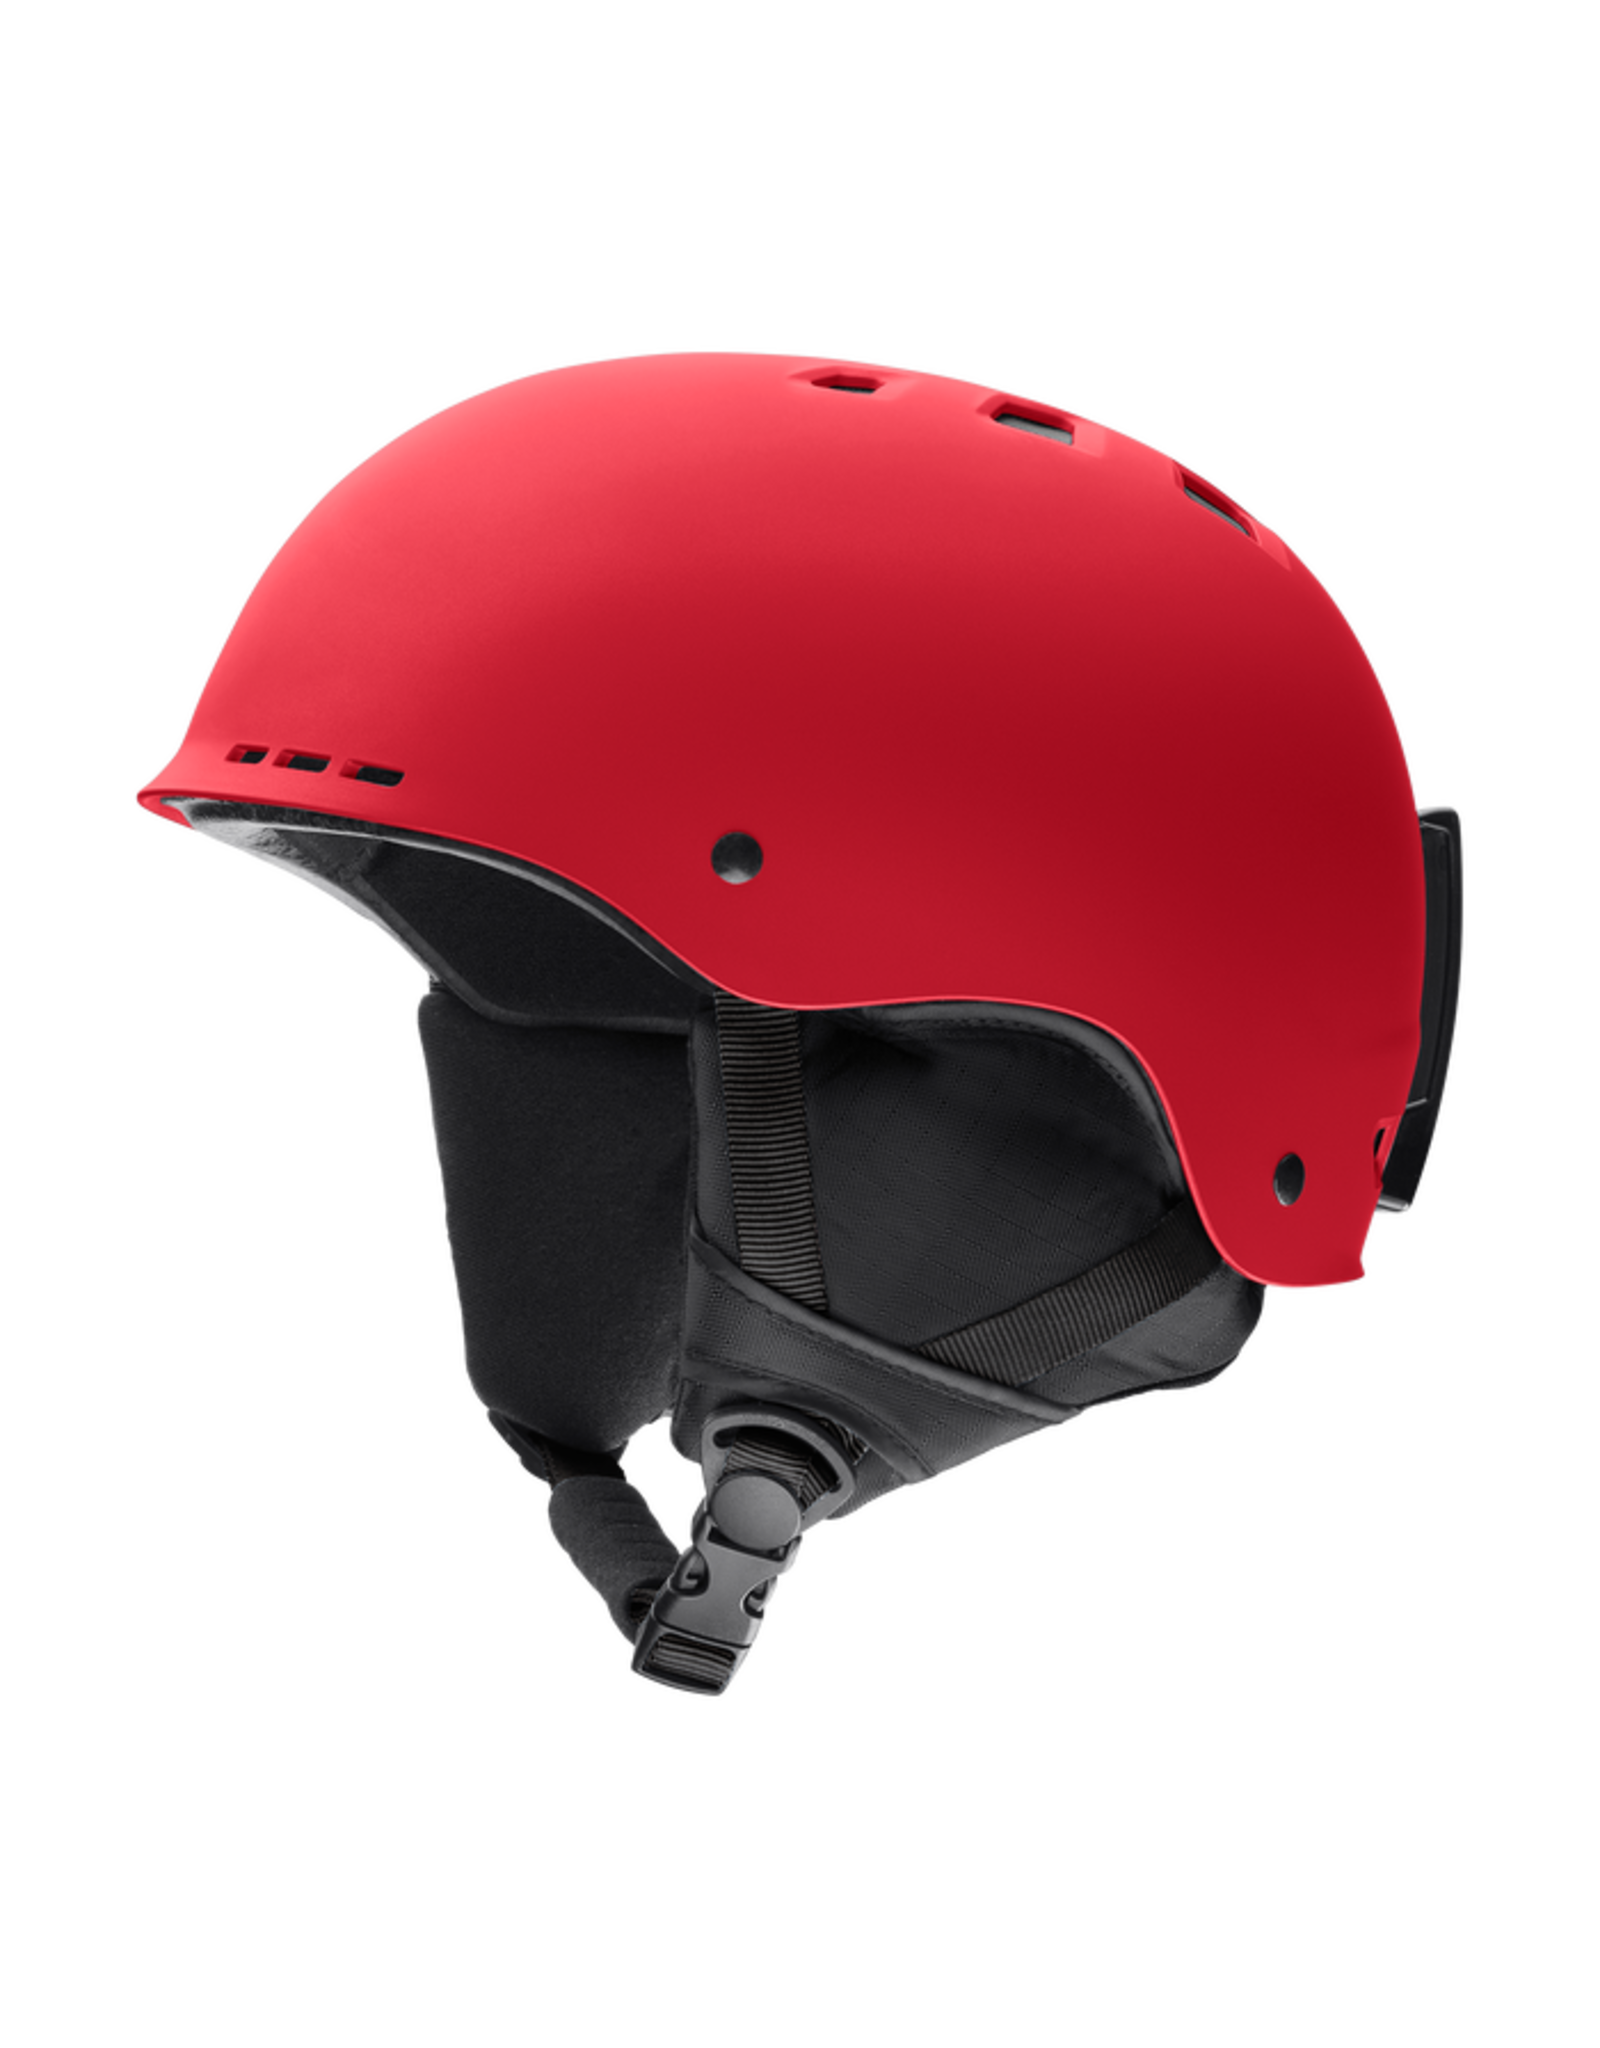 smith optics Smith Holt helmet - Matte Lava - Small 51-55cm